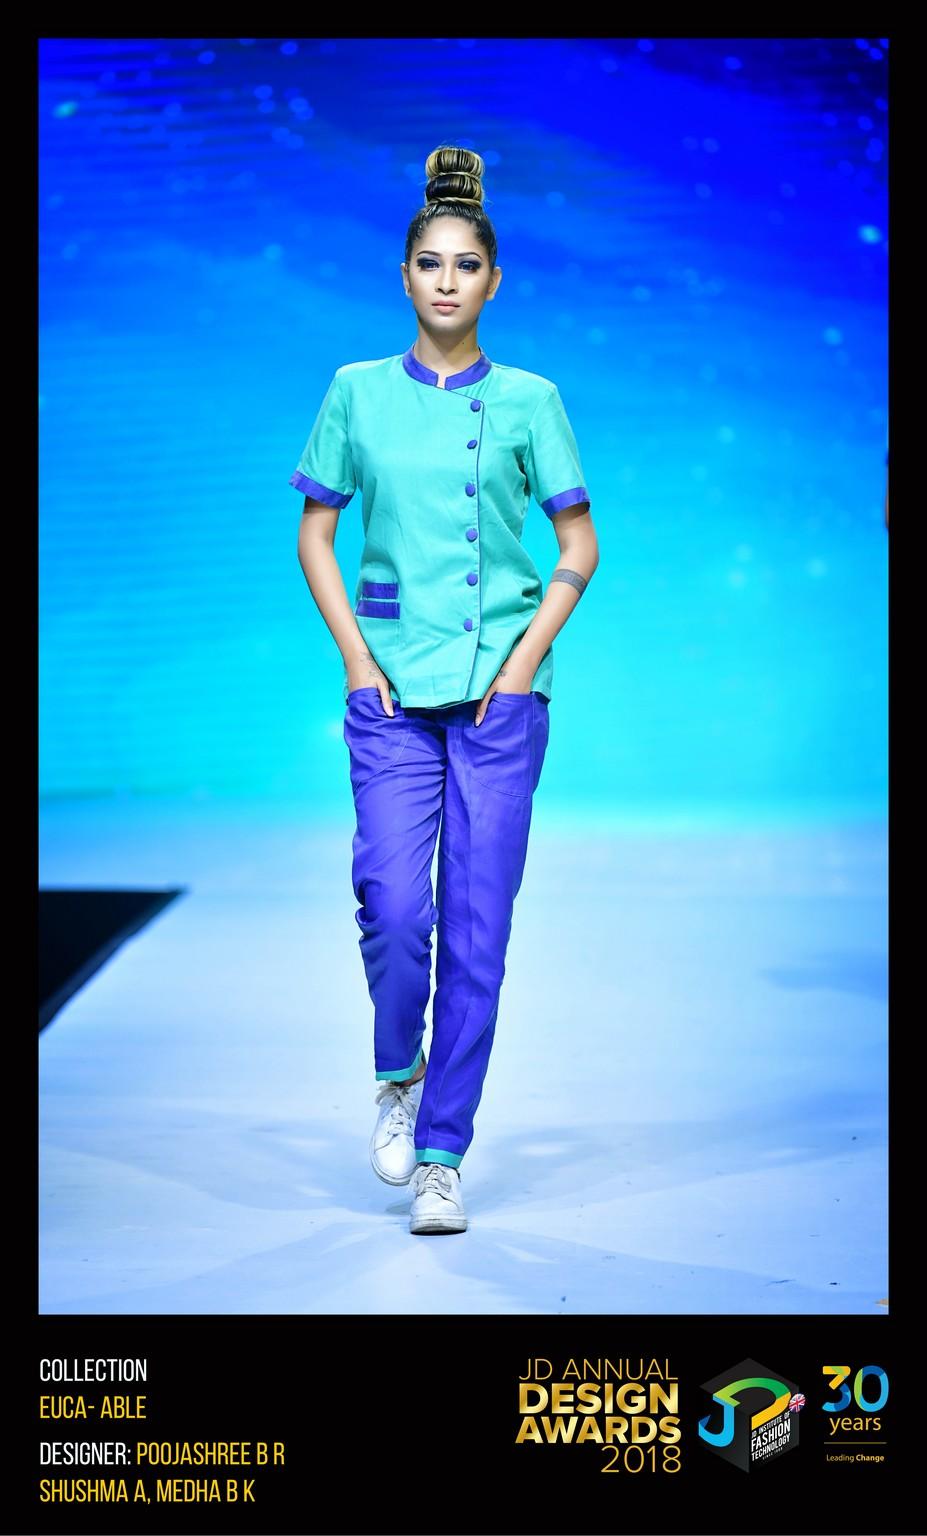 Euca-able – Change – JD Annual Design Awards 2018 | Designer: Poojashree, Sushma and Medha | Photography : Jerin Nath (@jerin_nath) euca-able – change – jd annual design awards 2018 - EUCA ABLE 4 - Euca-able – Change – JD Annual Design Awards 2018